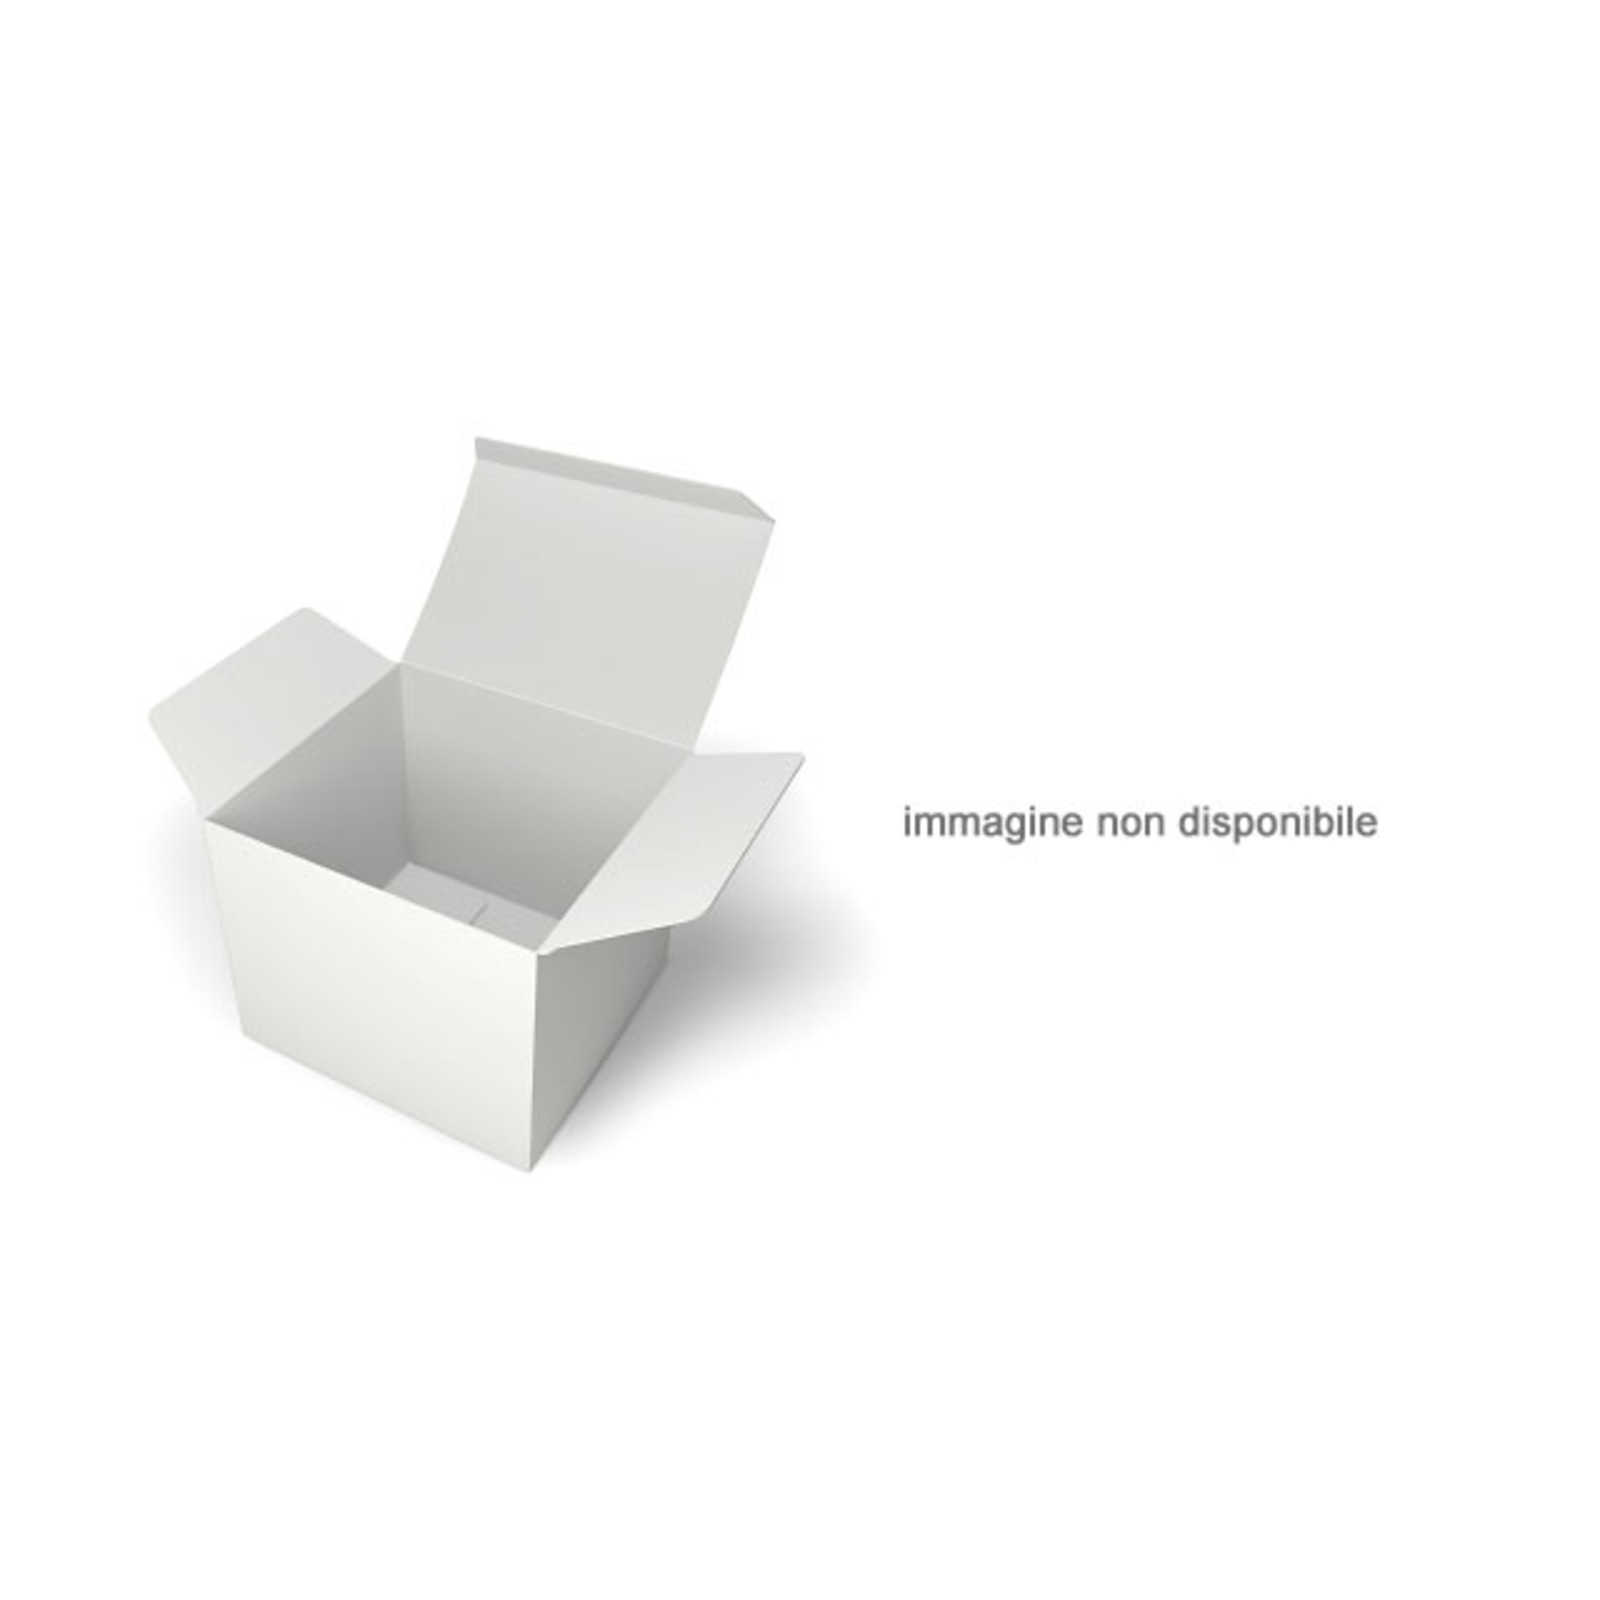 Lierac - Crema viso antirughe - Coherence - Concentrè Absolu